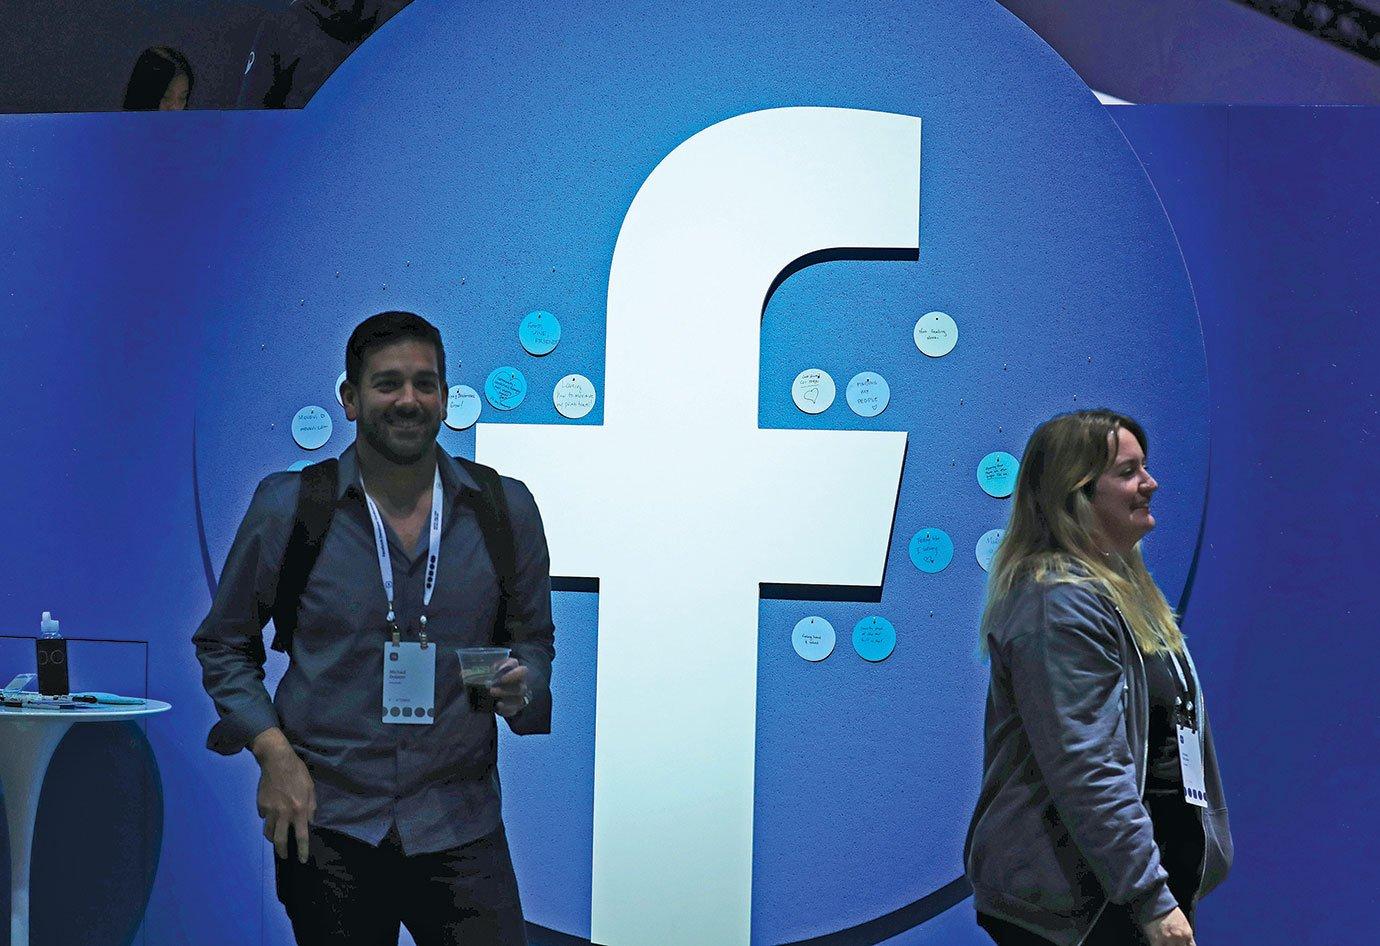 在2019臉書F8年度開發者大會上,公佈了新的logo。(Justin Sullivan/Getty Images)